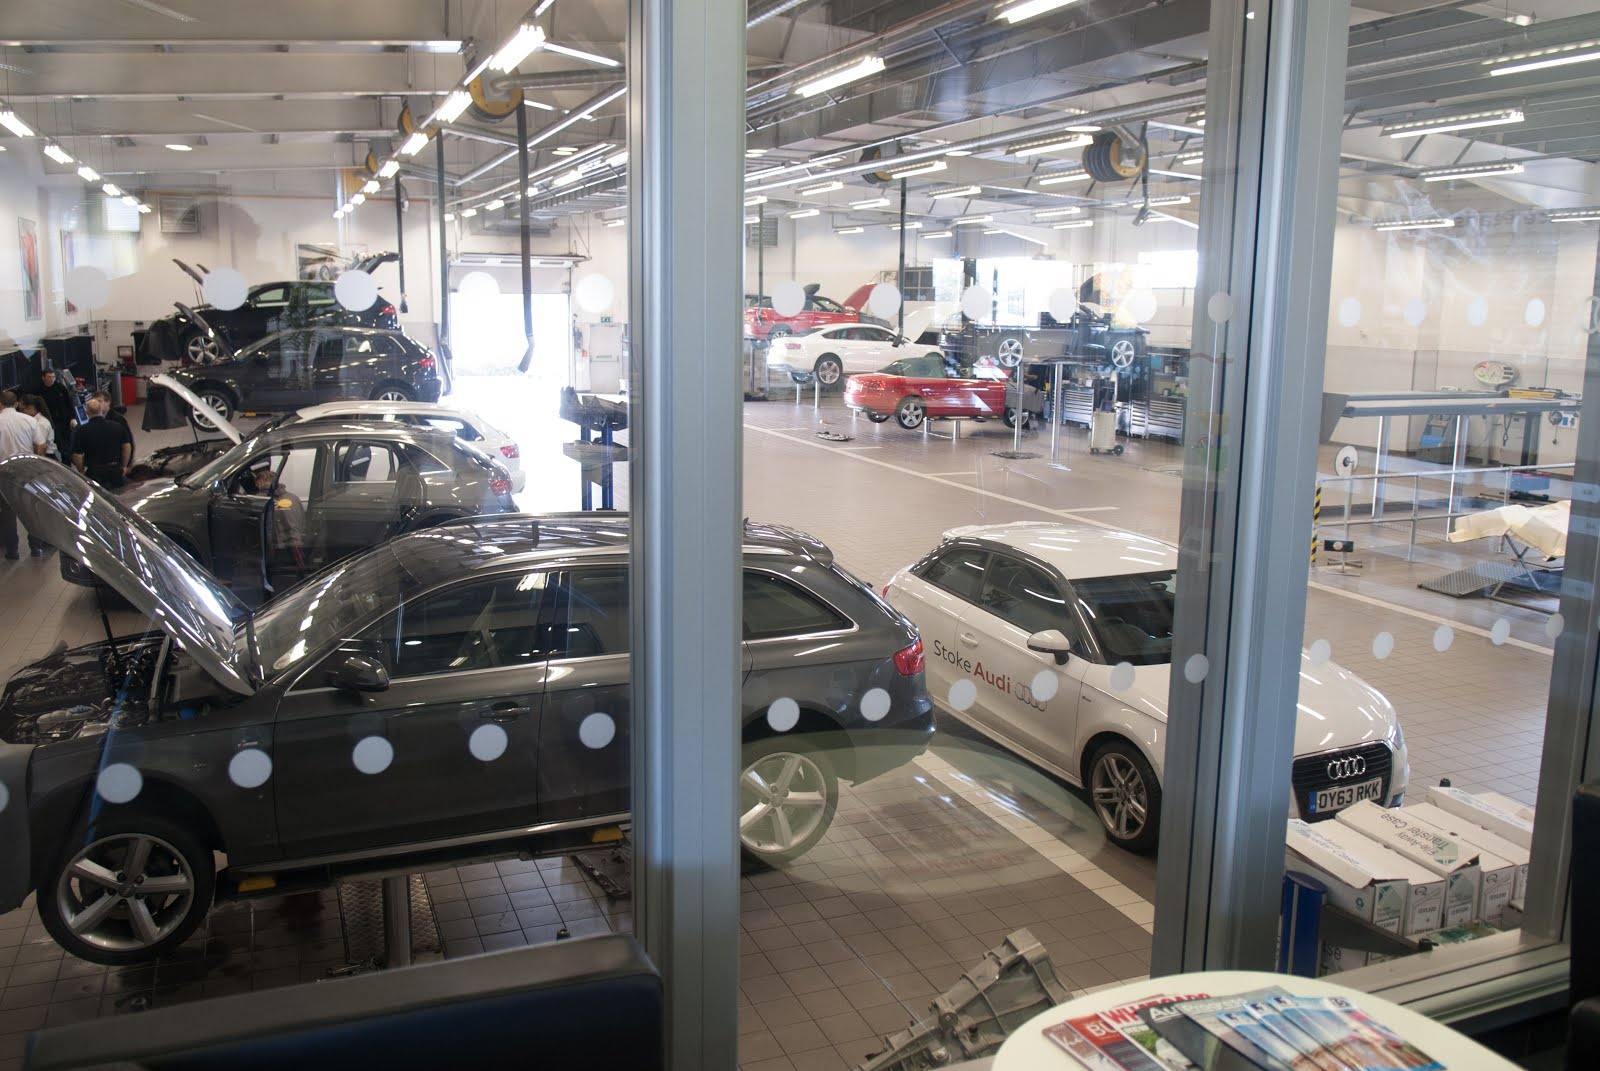 Stoke AUdi workshop seen through the viewing window